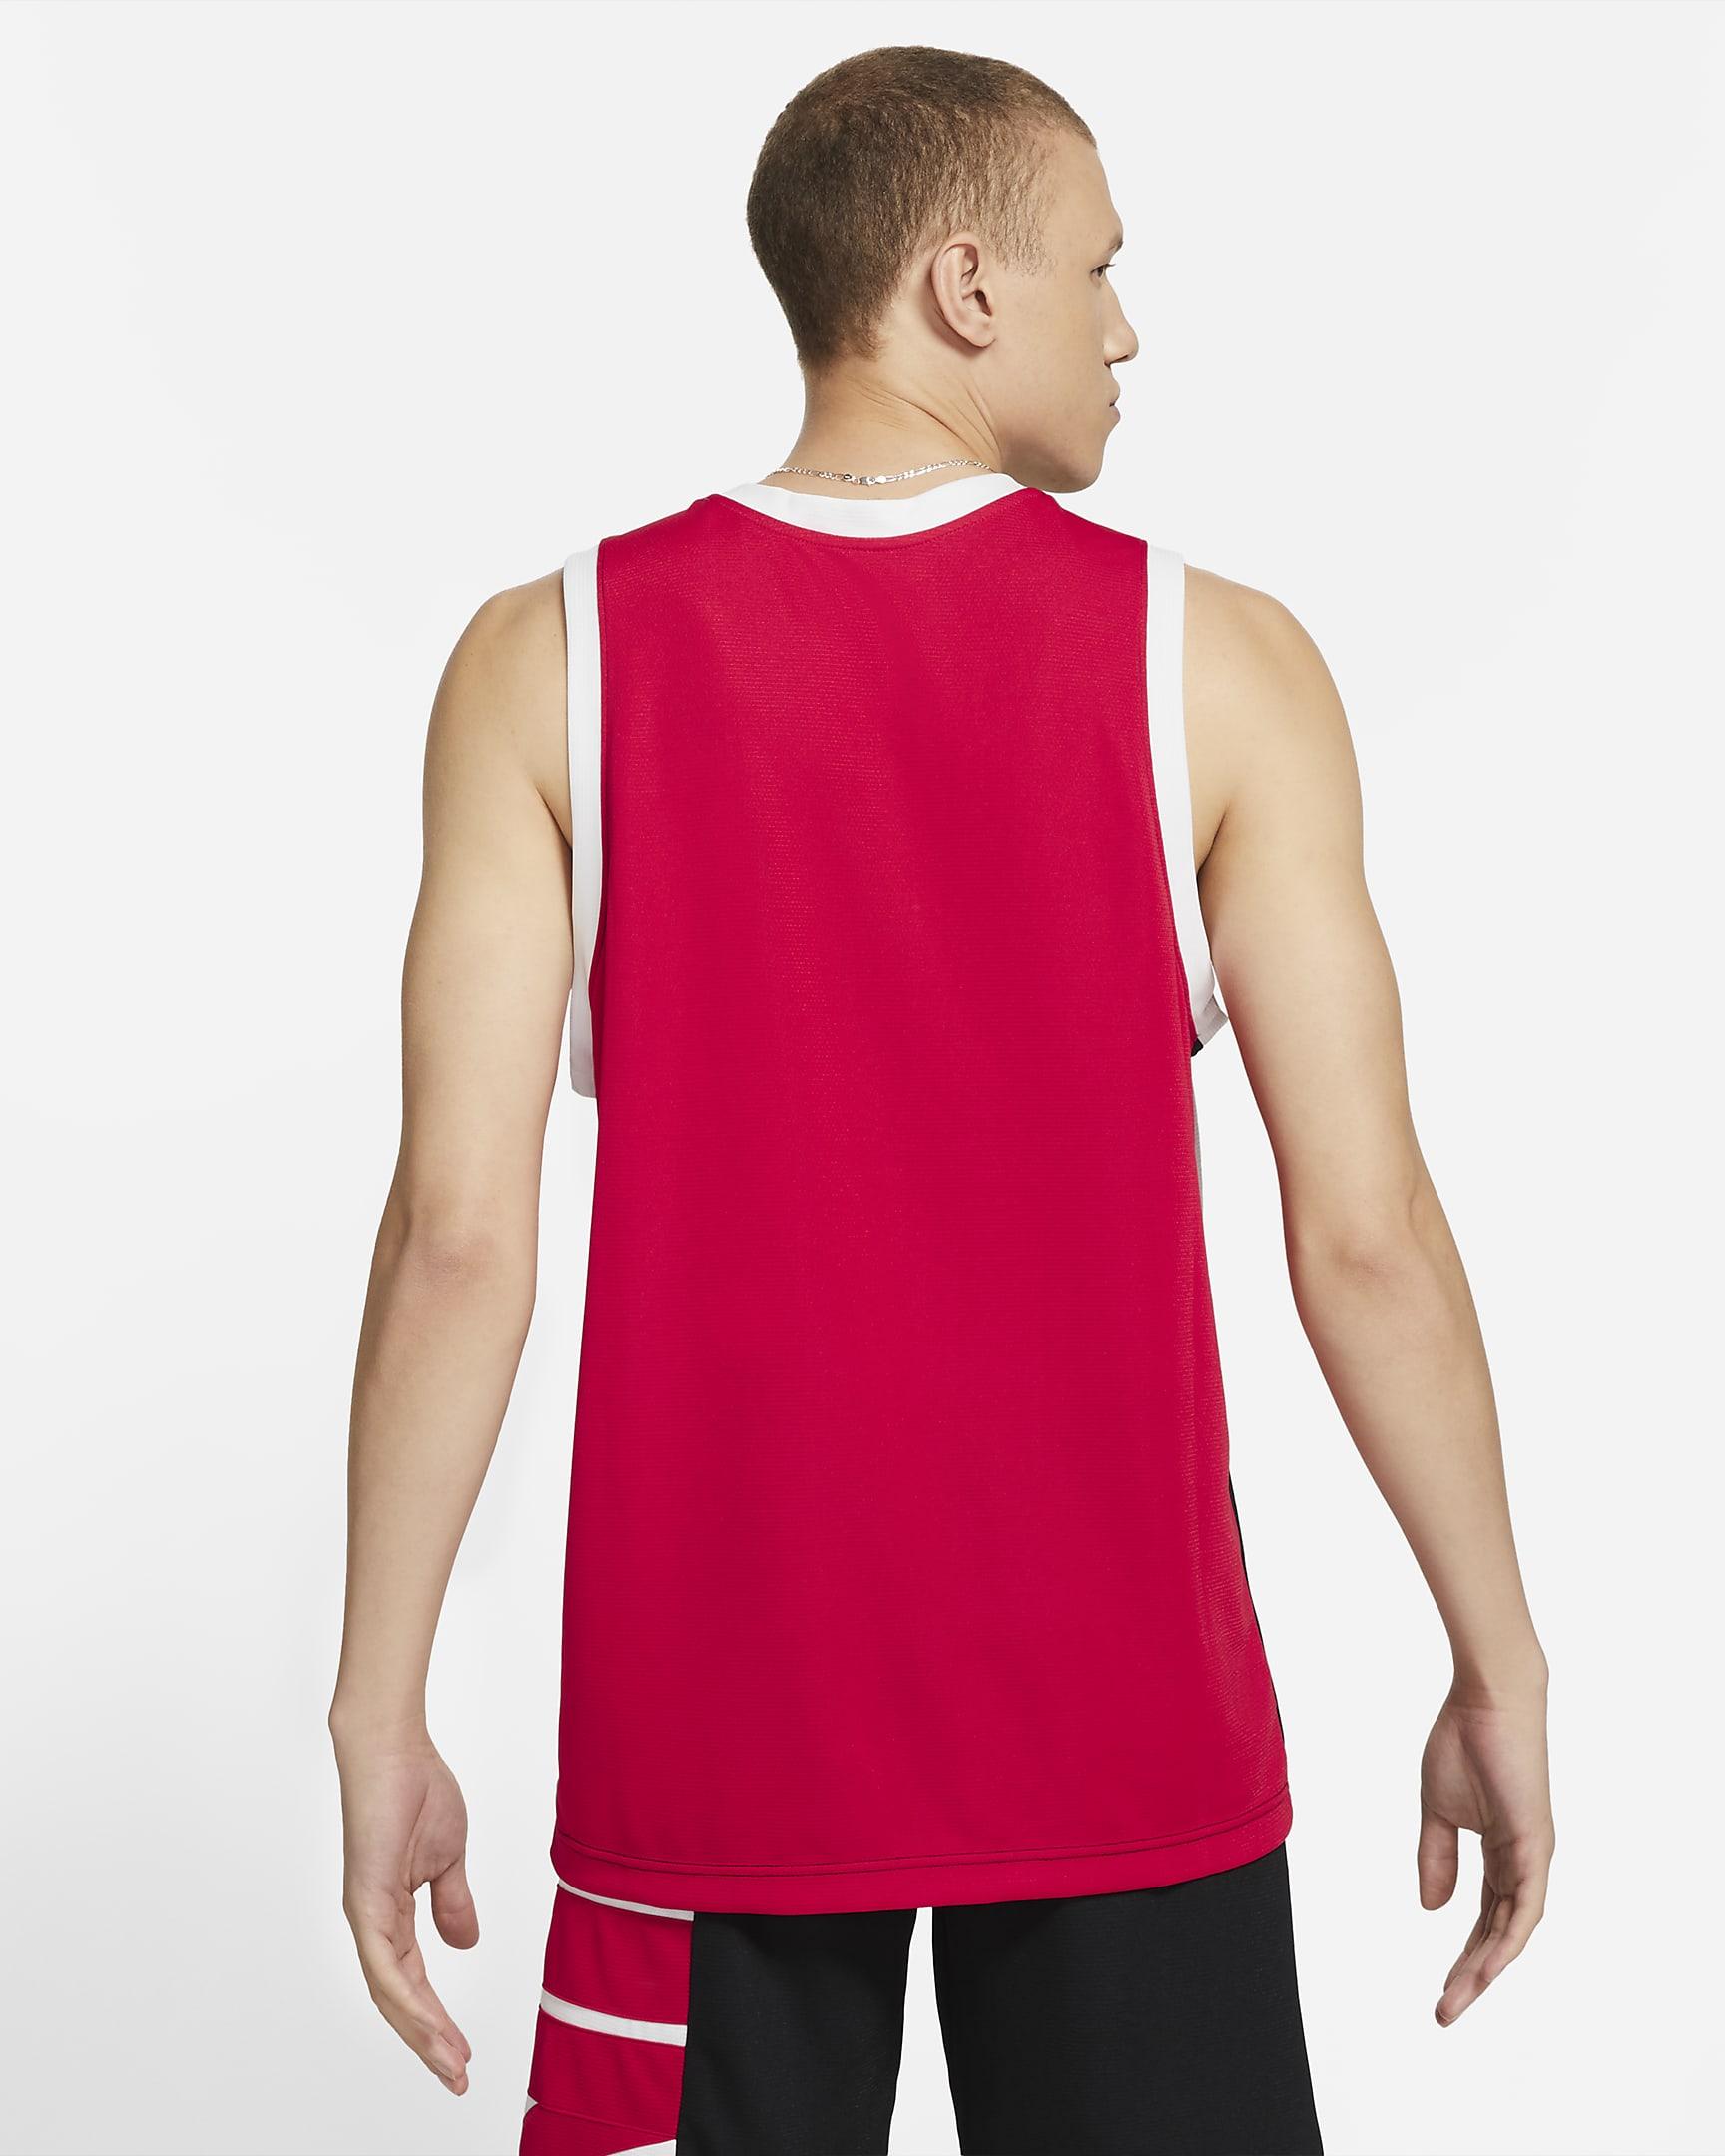 dri-fit-mens-basketball-jersey-T1qLCl-1